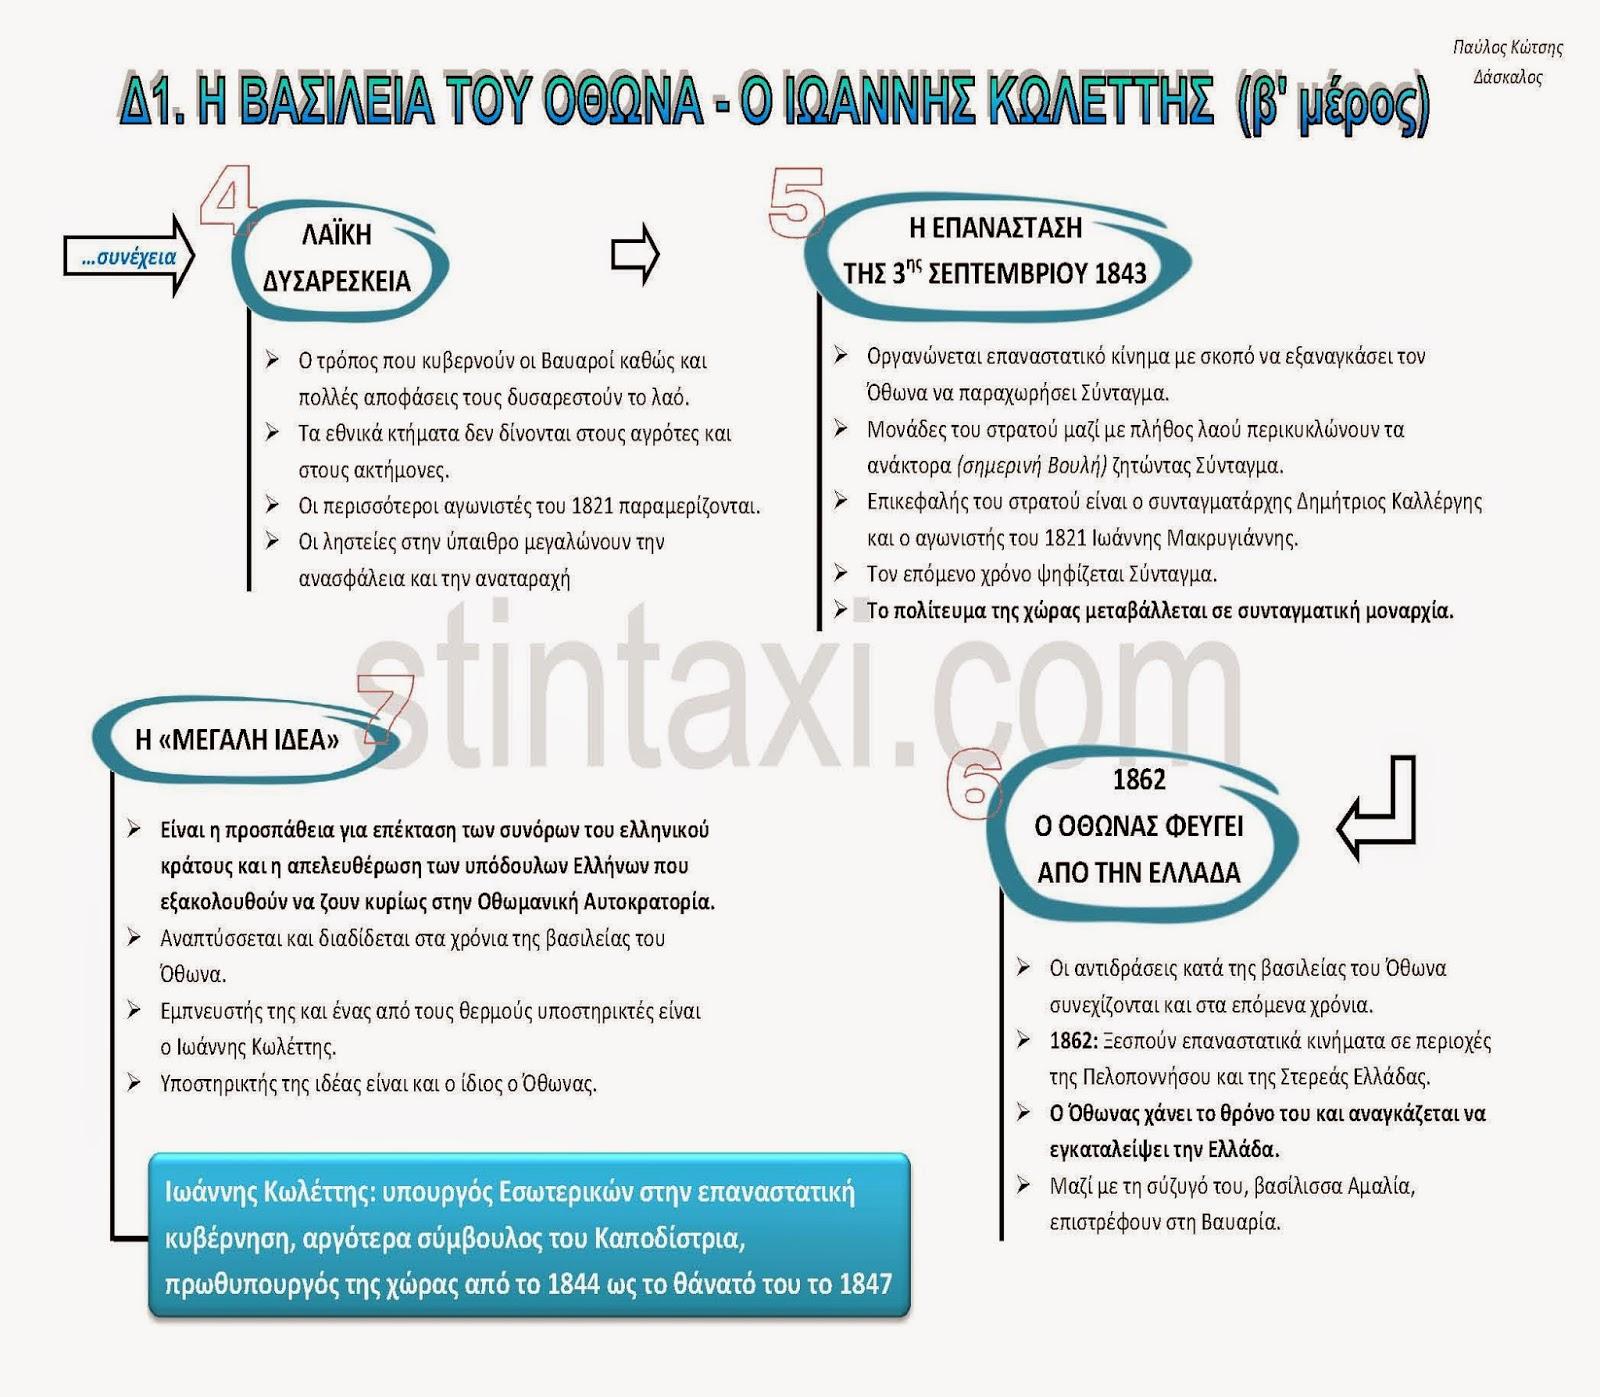 http://www.stintaxi.com/uploads/1/3/1/0/13100858/d1b-othonas-kolettis-v2.1.pdf